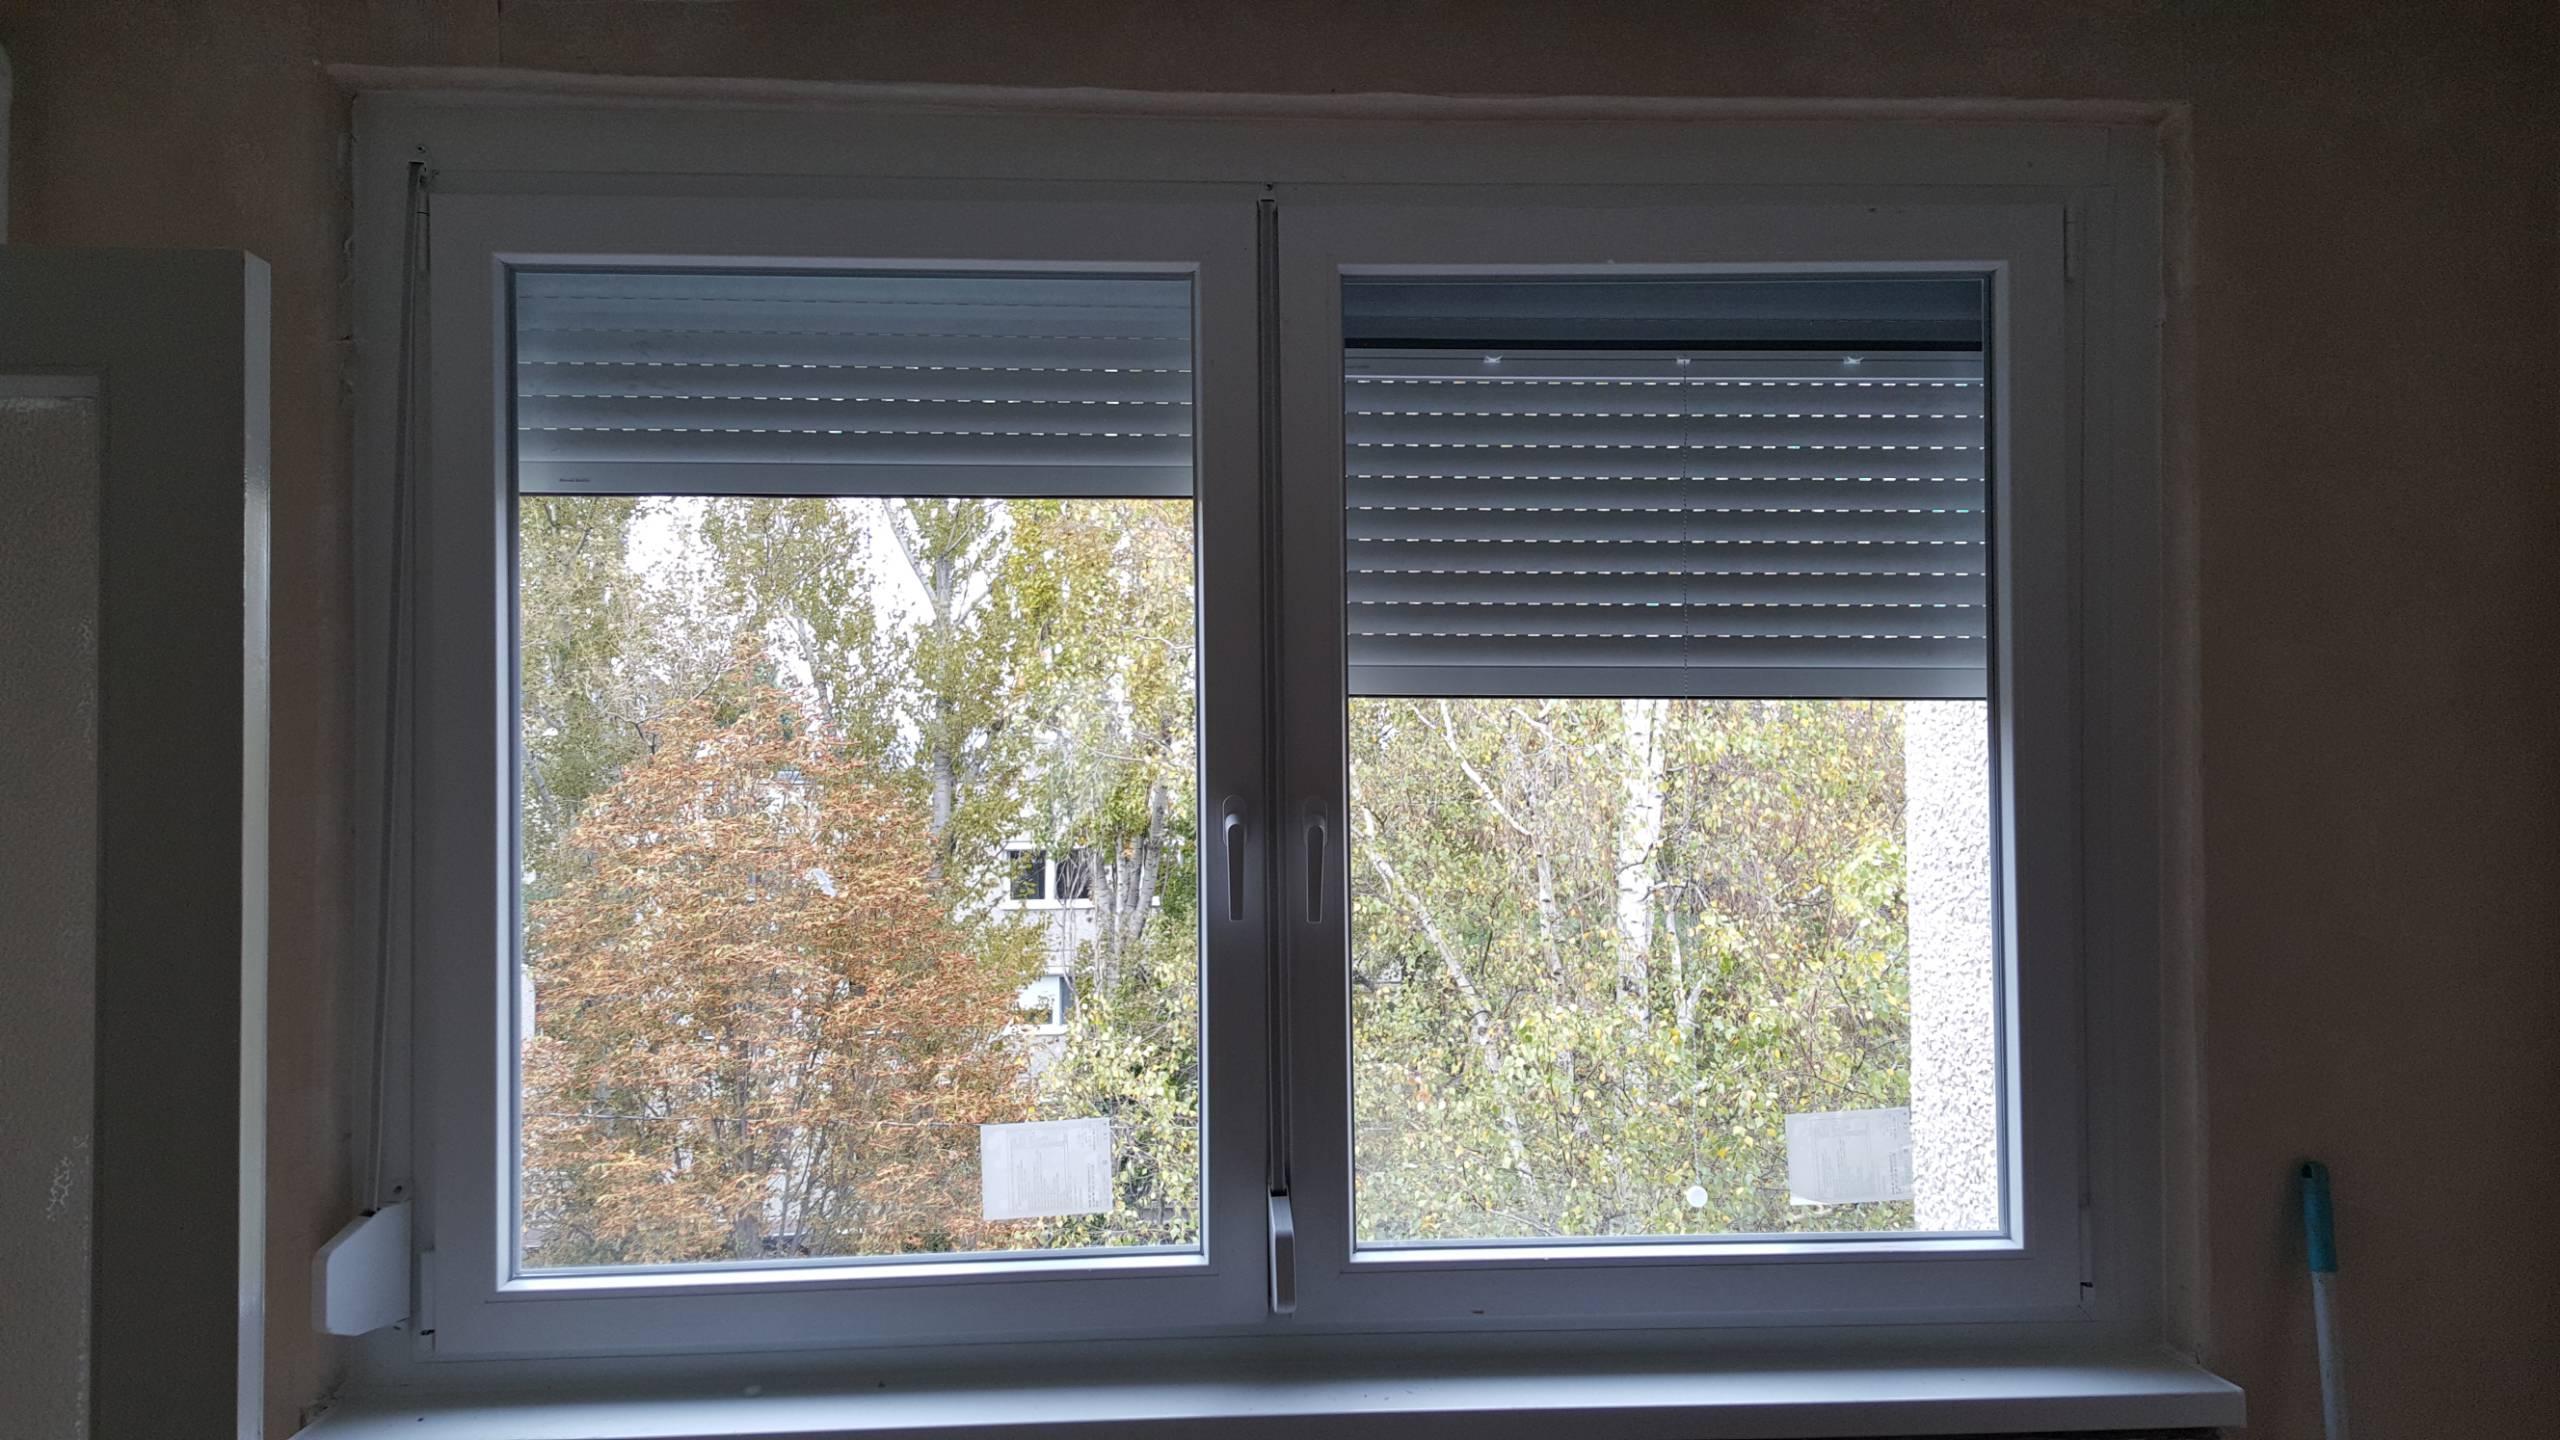 uj ablakok 2